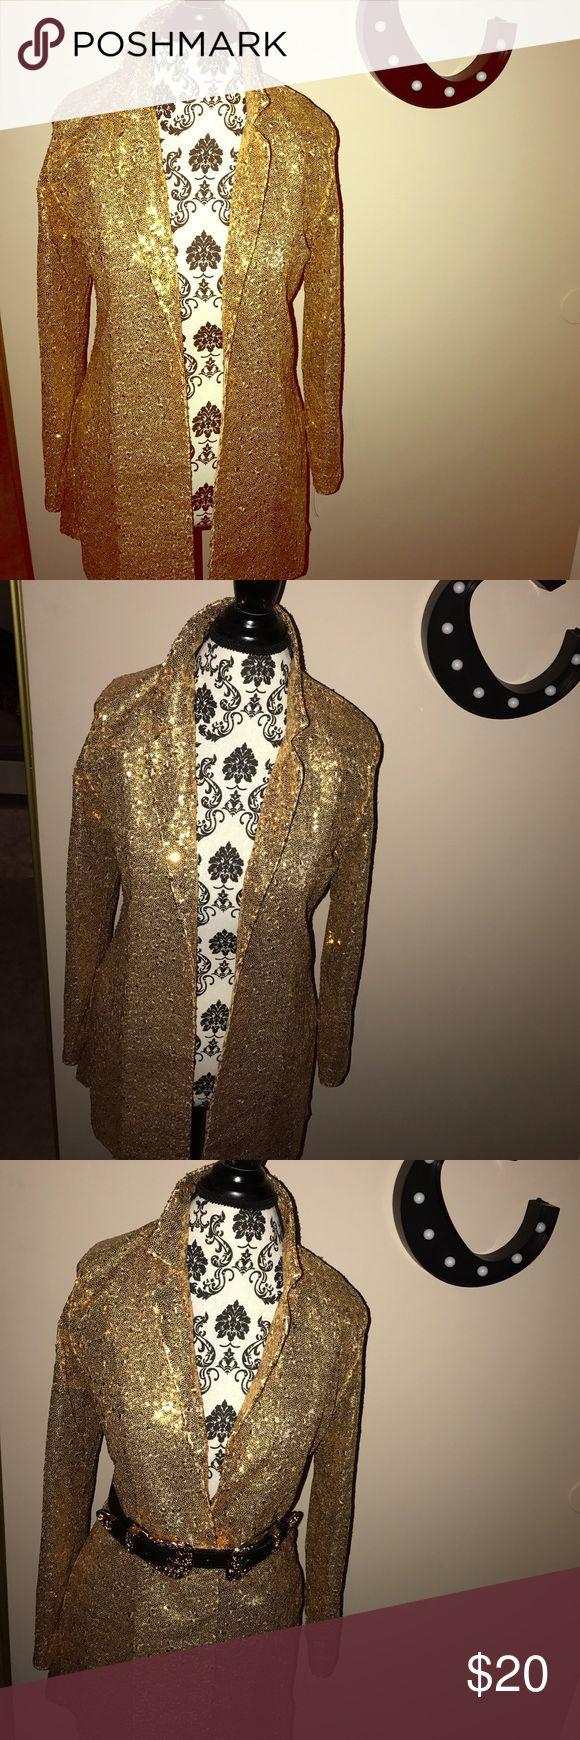 Gold sequin jacket Brand new from overseas! Gold sequin blazer! Jackets & Coats Blazers